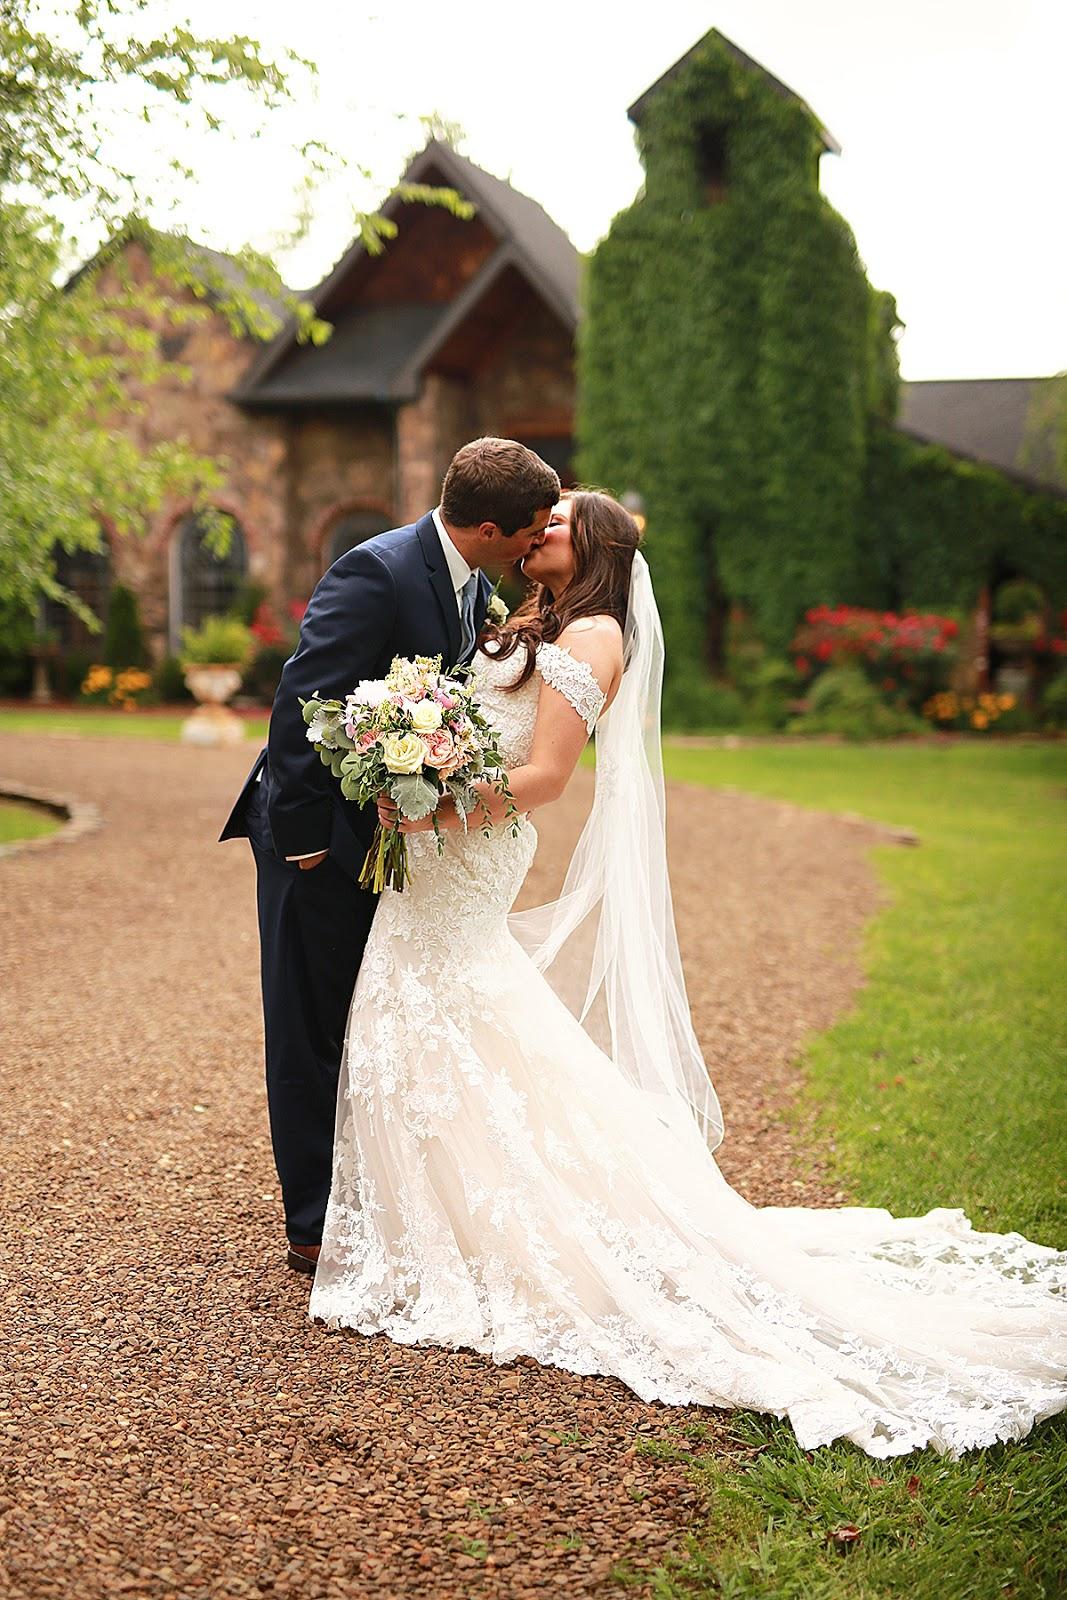 Camo Wedding Dresses Cheap 31 Luxury Yay for no rain